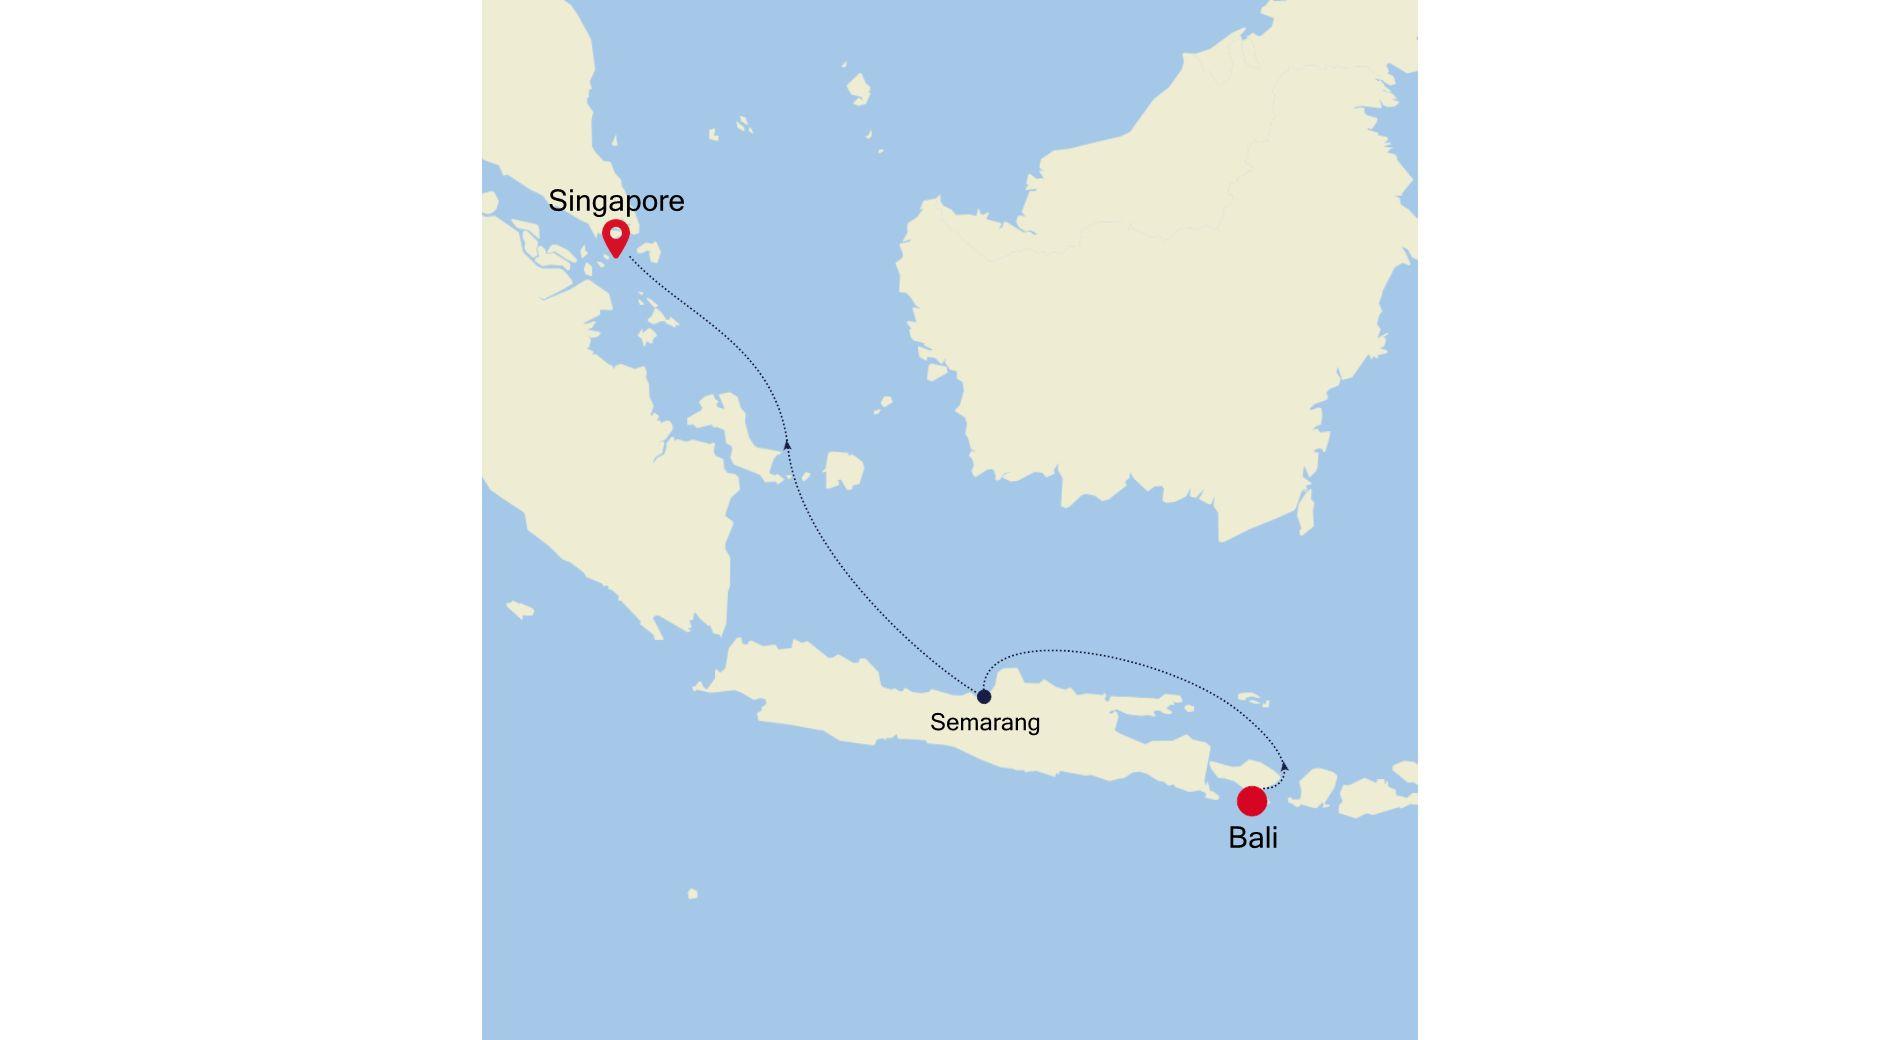 6007C - Bali nach Singapore